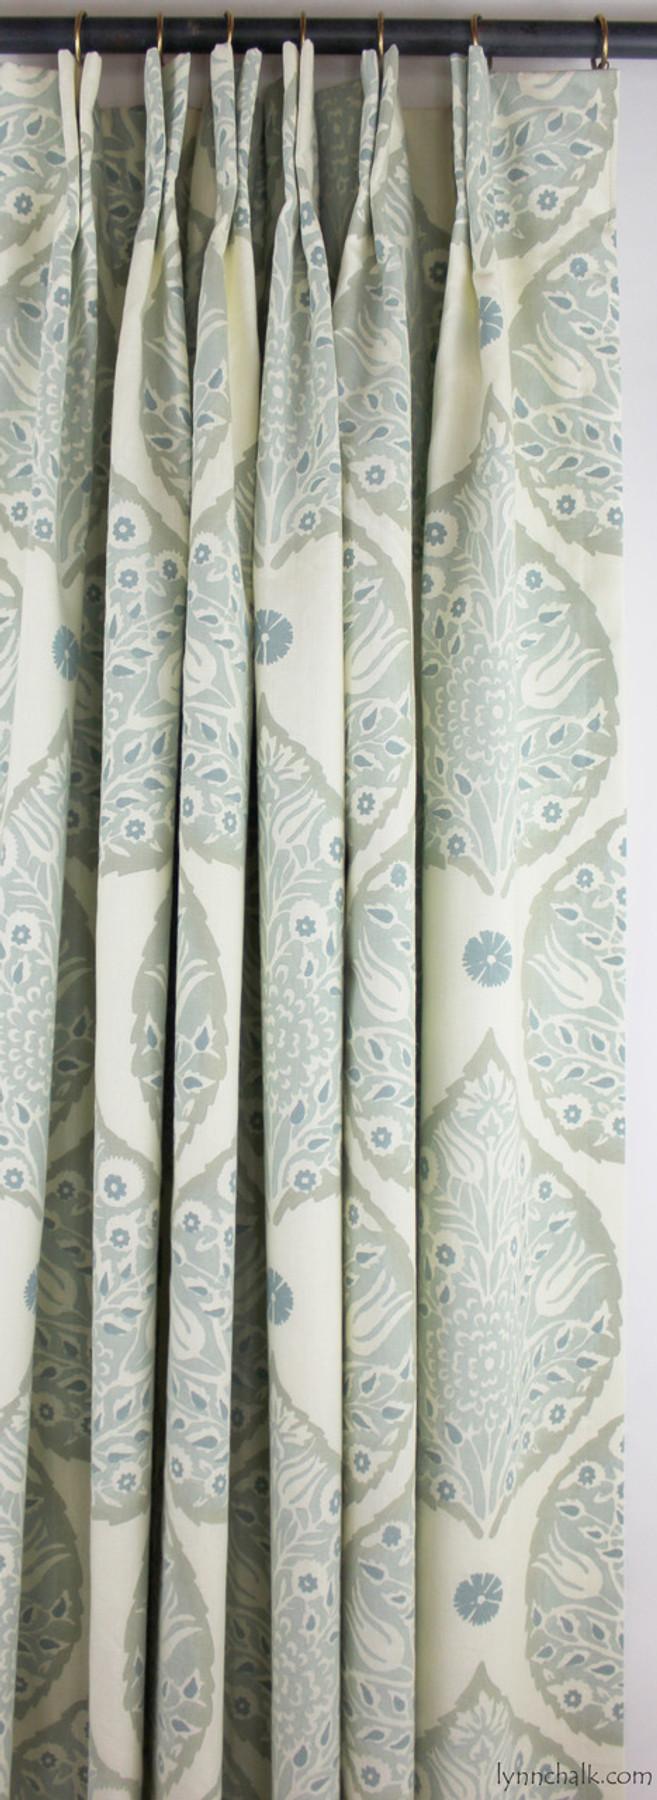 Galbraith & Paul Lotus Custom Pillows with Self Welting (shown in Dove Grey on Logan Cream Linen)